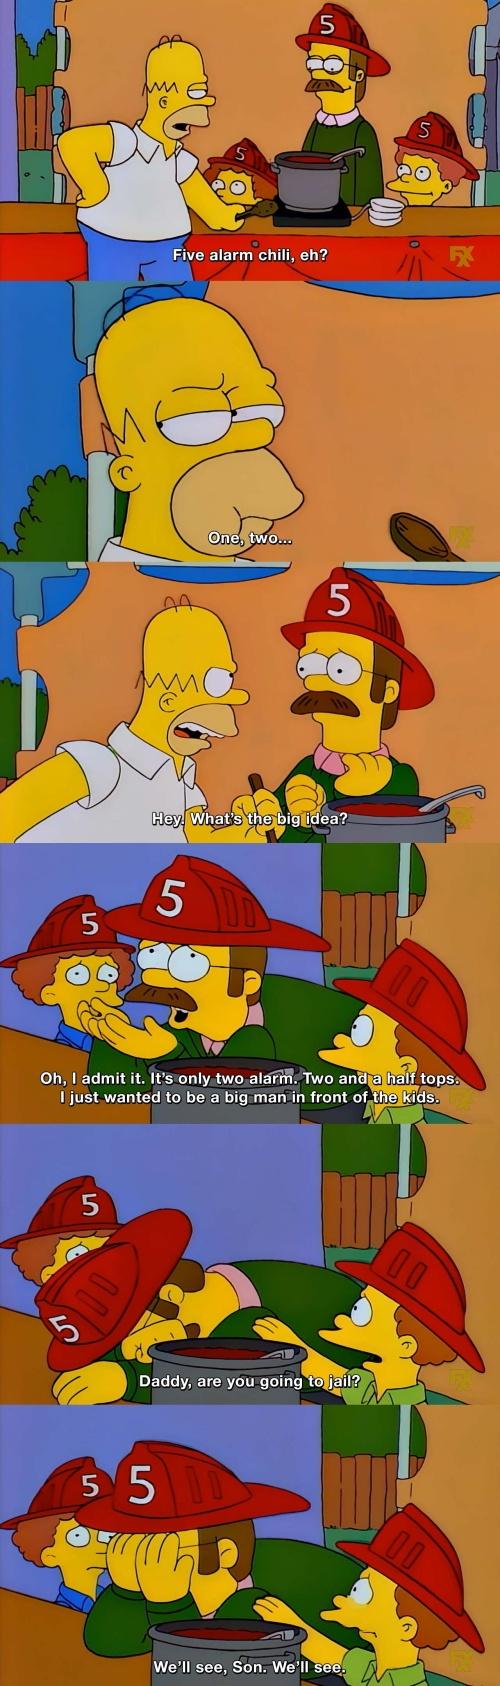 The Simpsons - Five alarm chili